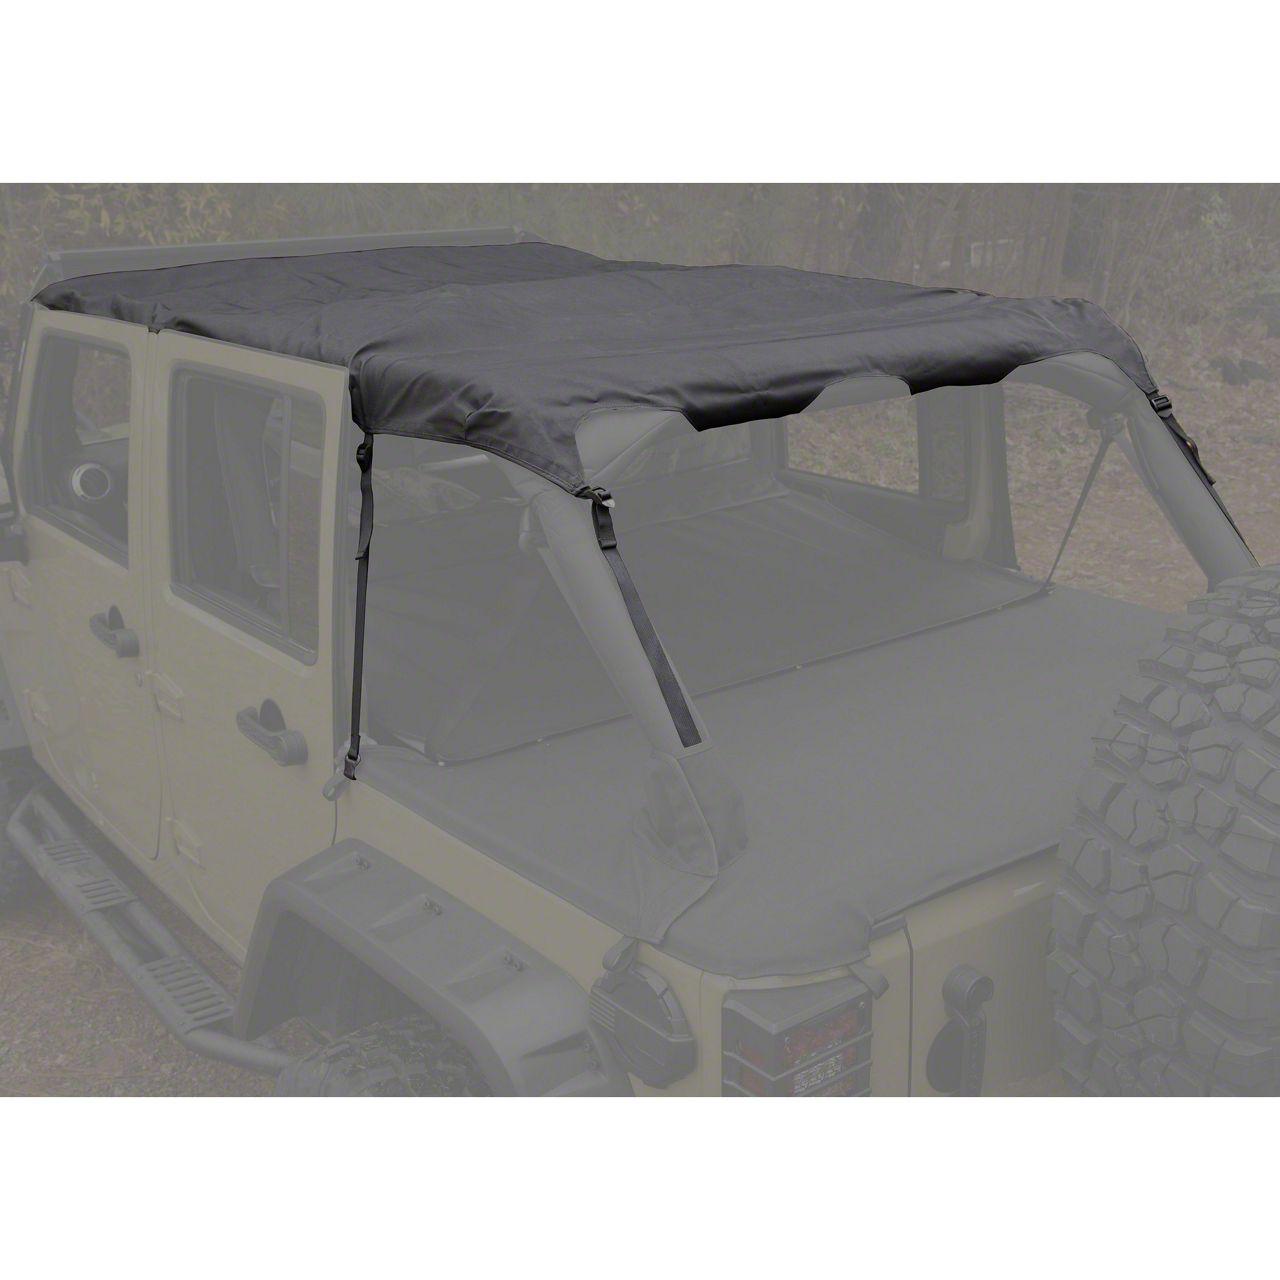 Rugged Ridge Montana Pocket Island Topper - Black Diamond (07-18 Jeep Wrangler JK 4 Door)